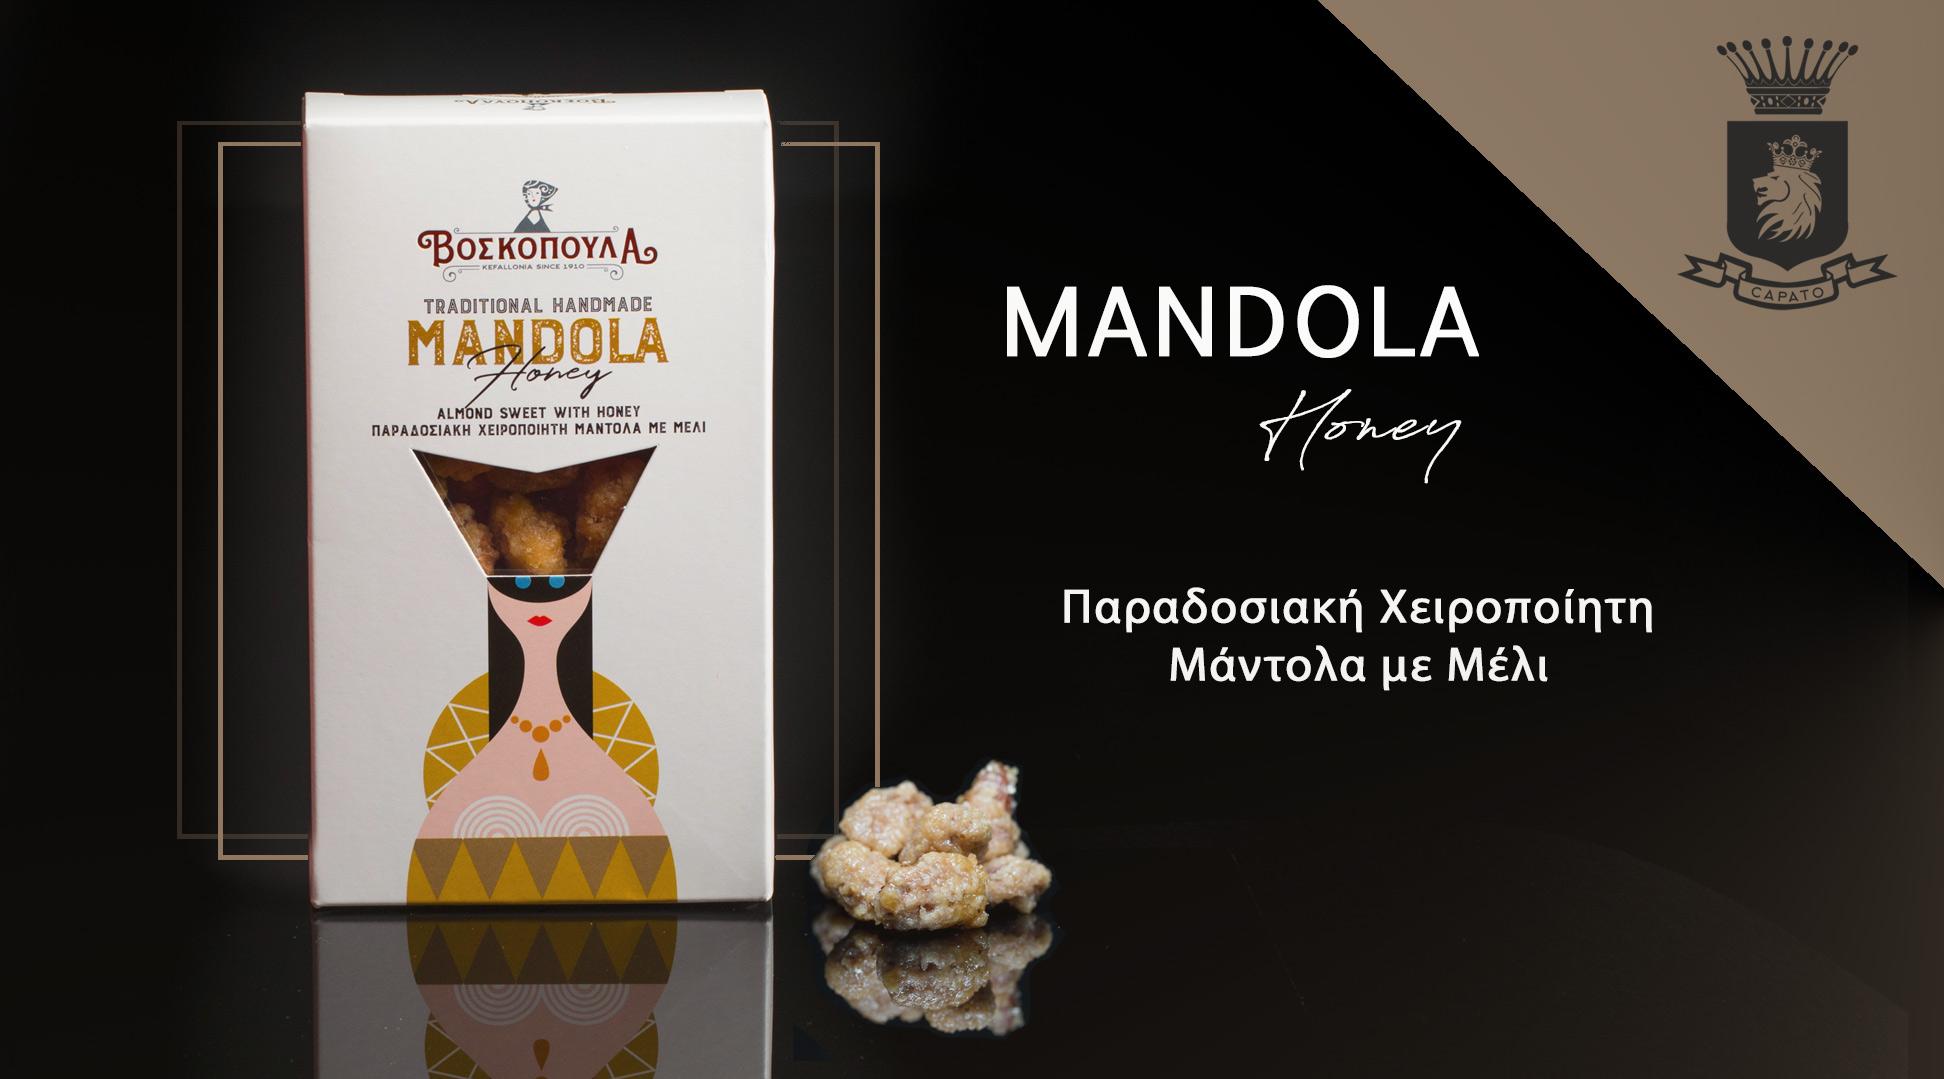 mandola_meliou_kefalonia_homepage2